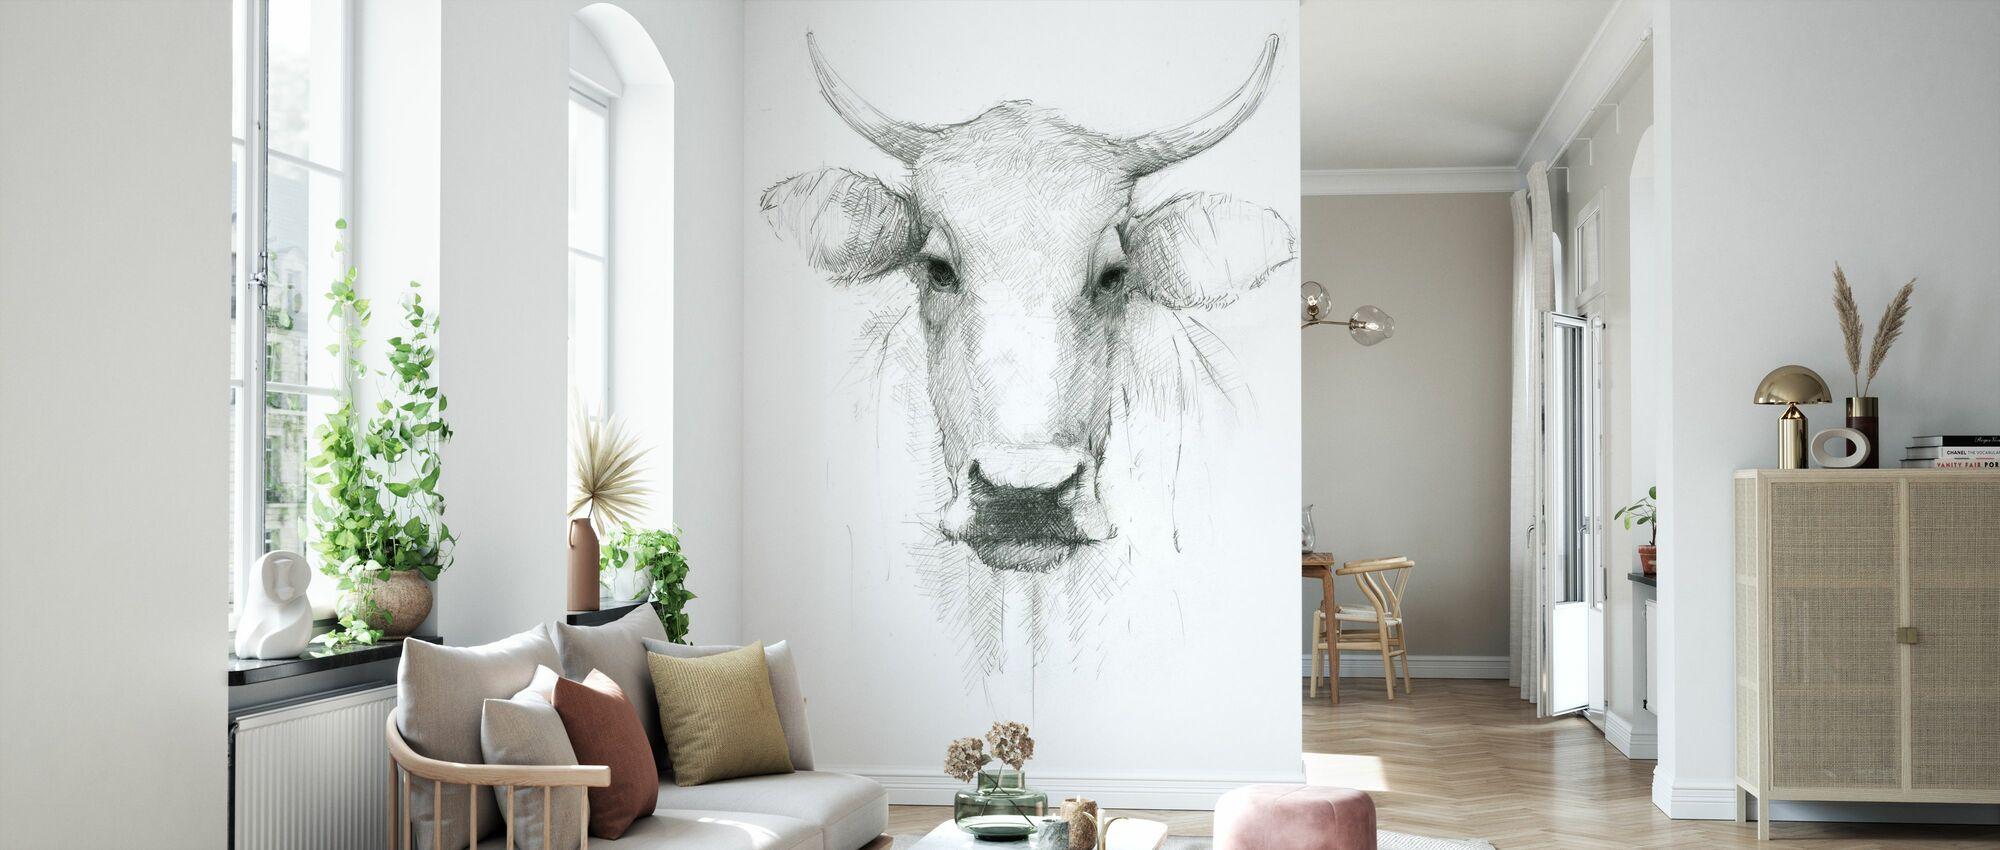 Cow Sketch - Wallpaper - Living Room